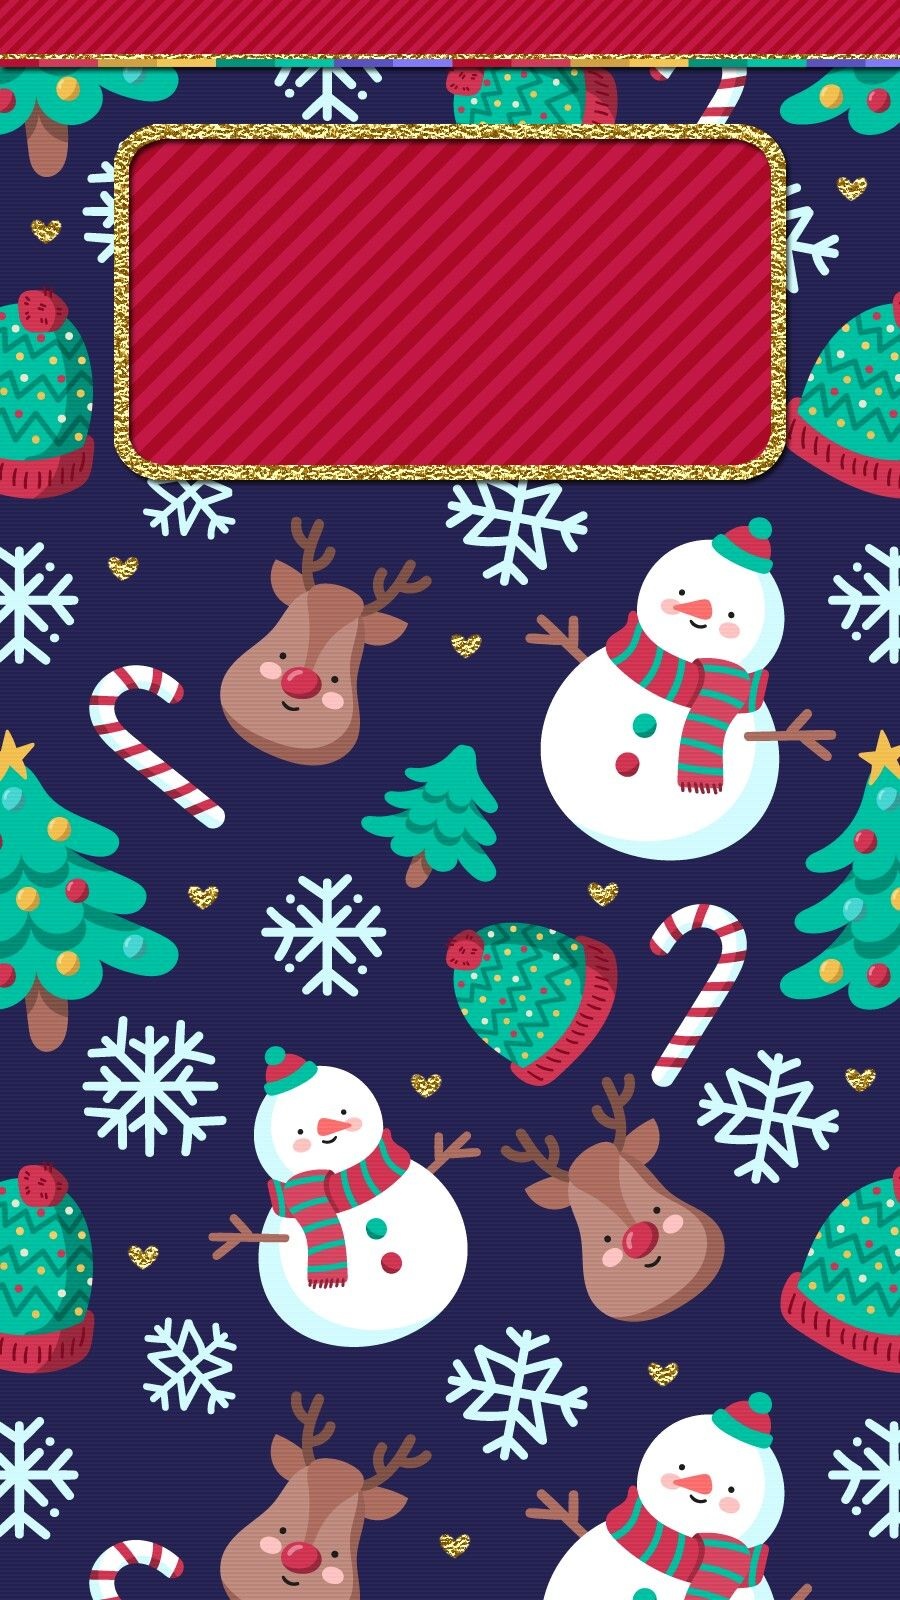 Digitalcutewalls Christmas Wallpaper Iphone Cute Wallpaper Iphone Christmas Iphone Wallpaper Winter